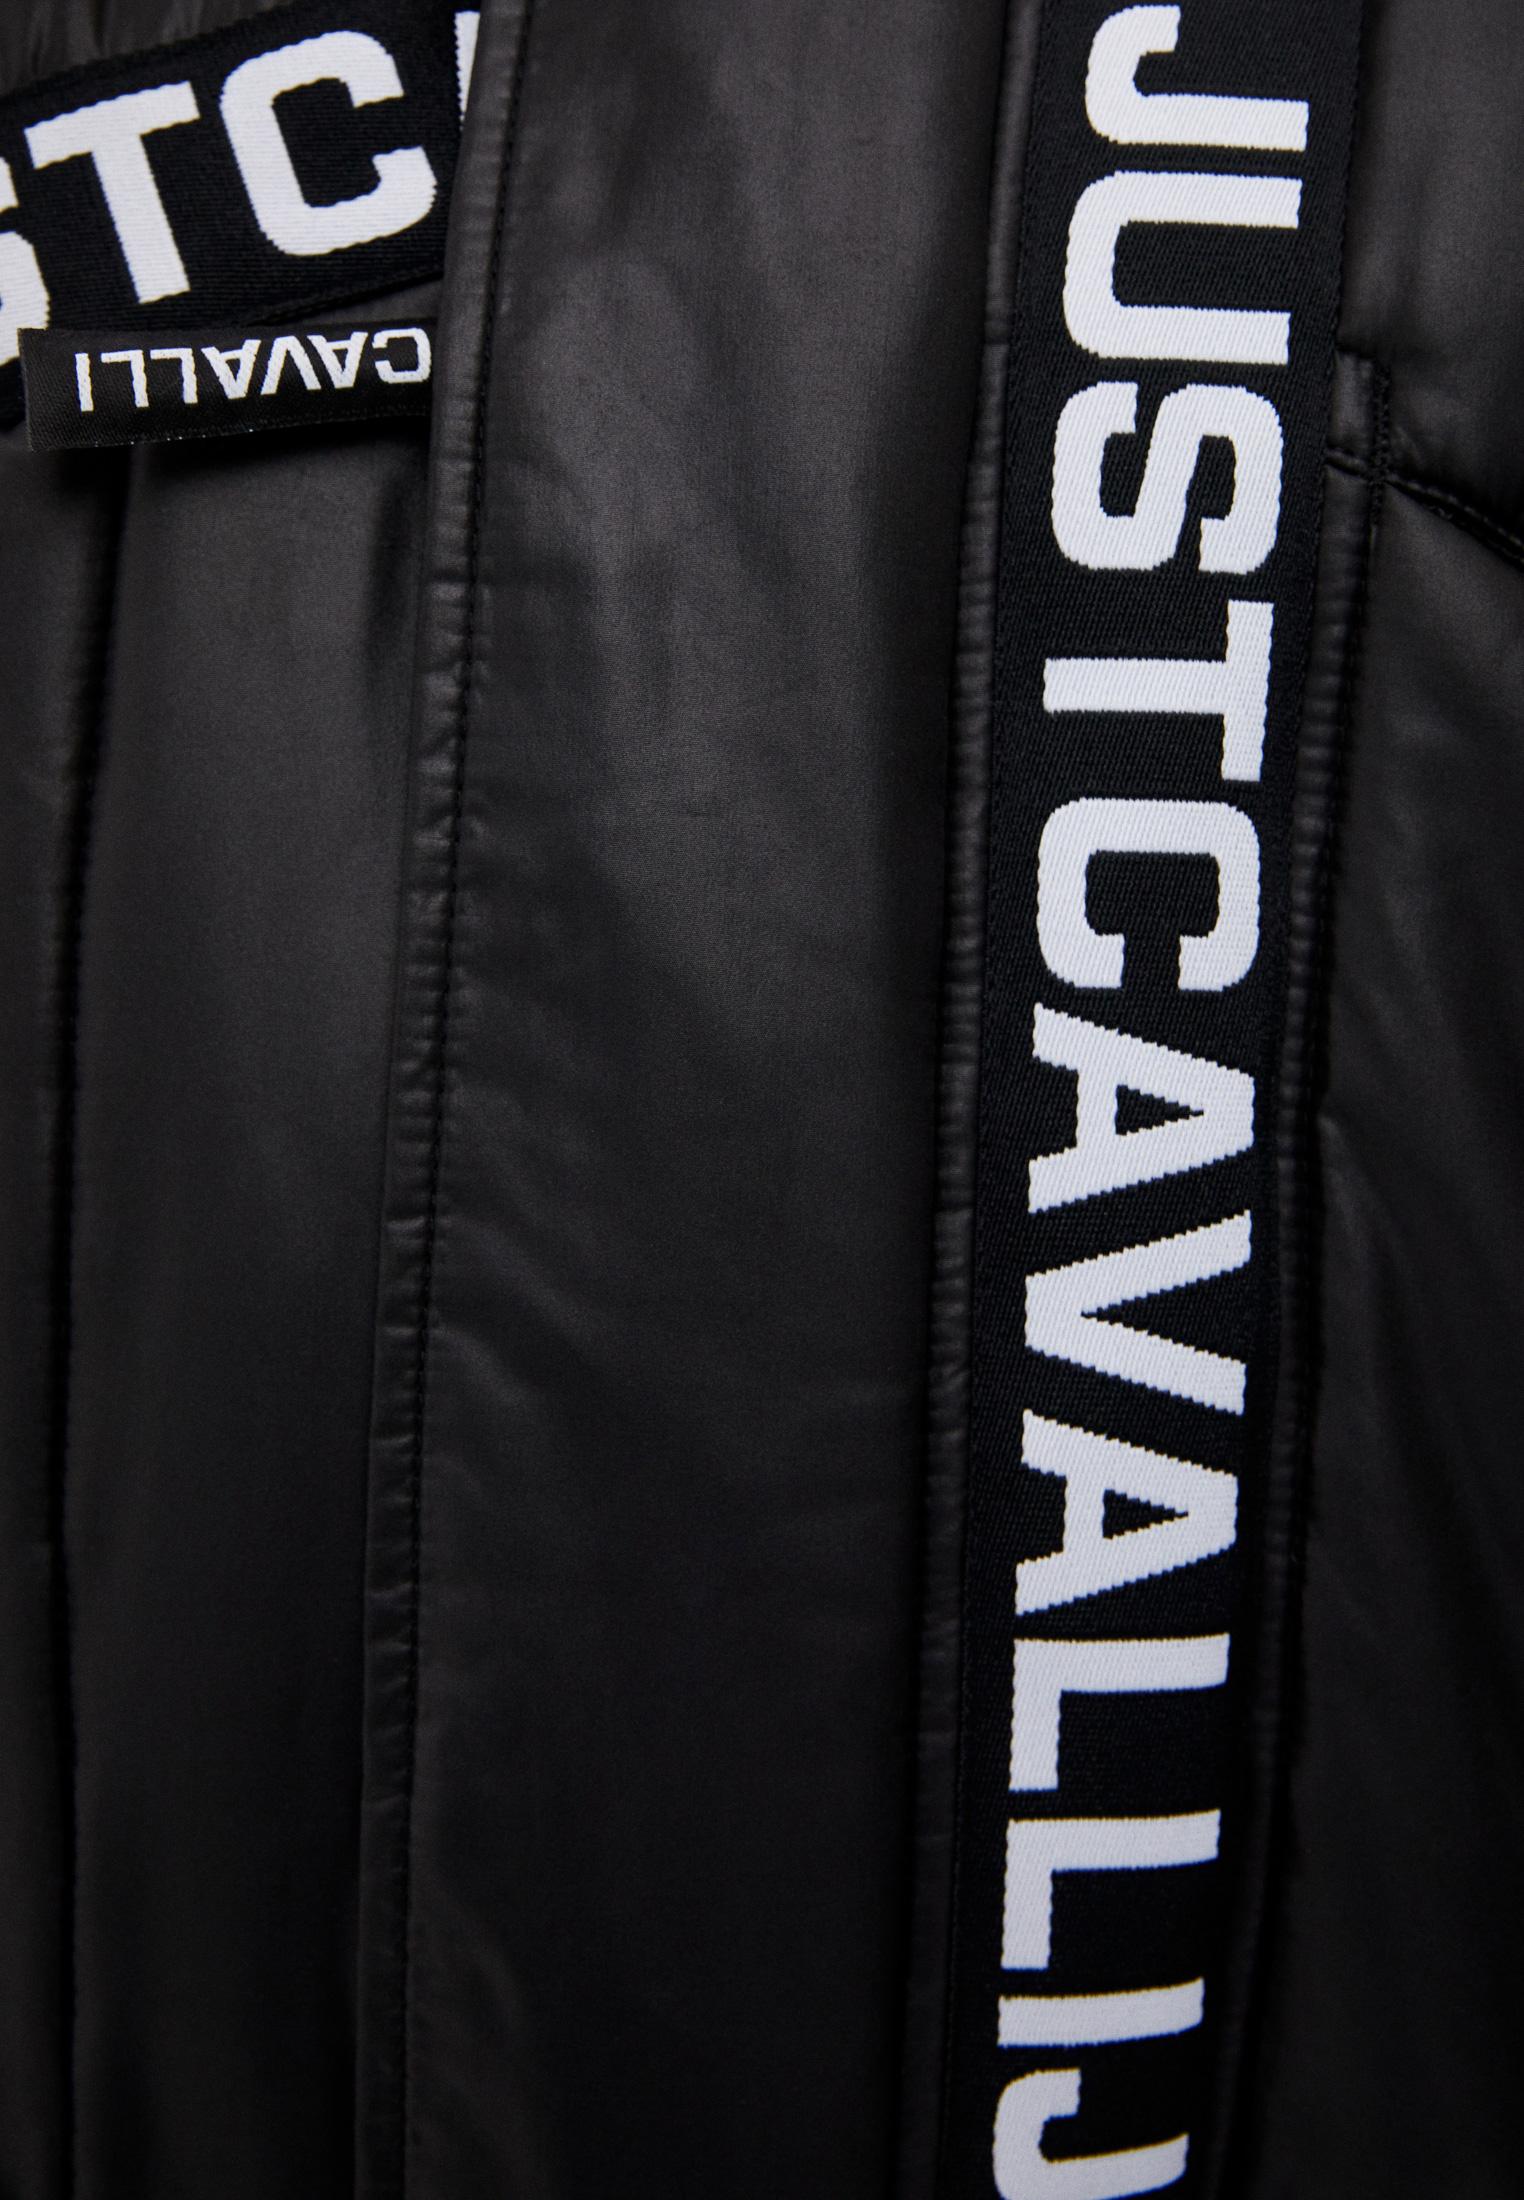 Куртка Just Cavalli (Джаст Кавалли) s01am0330n39530: изображение 6